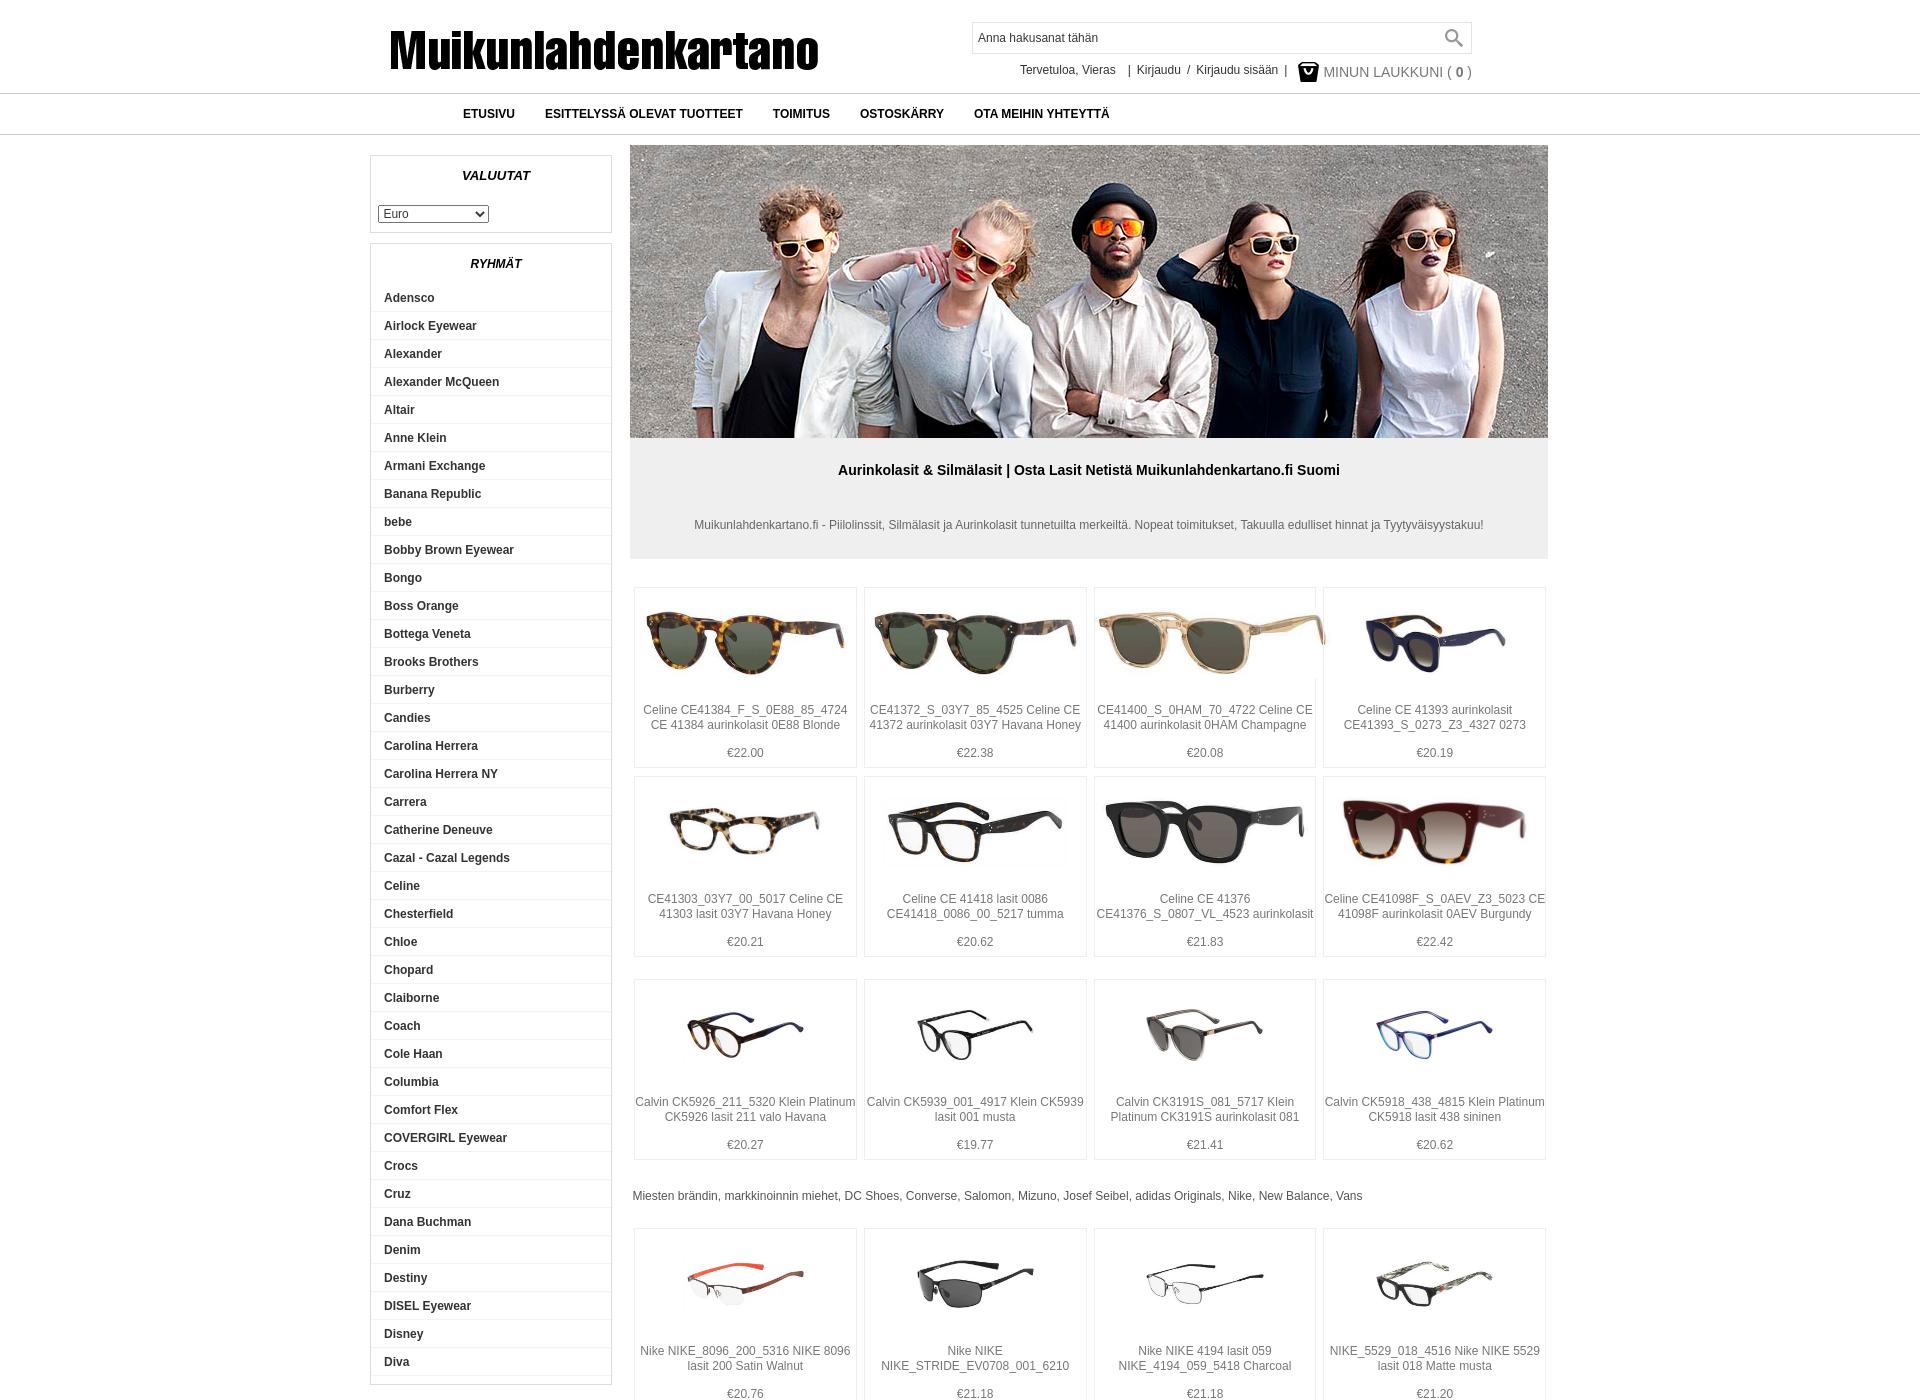 Screenshot for muikunlahdenkartano.fi